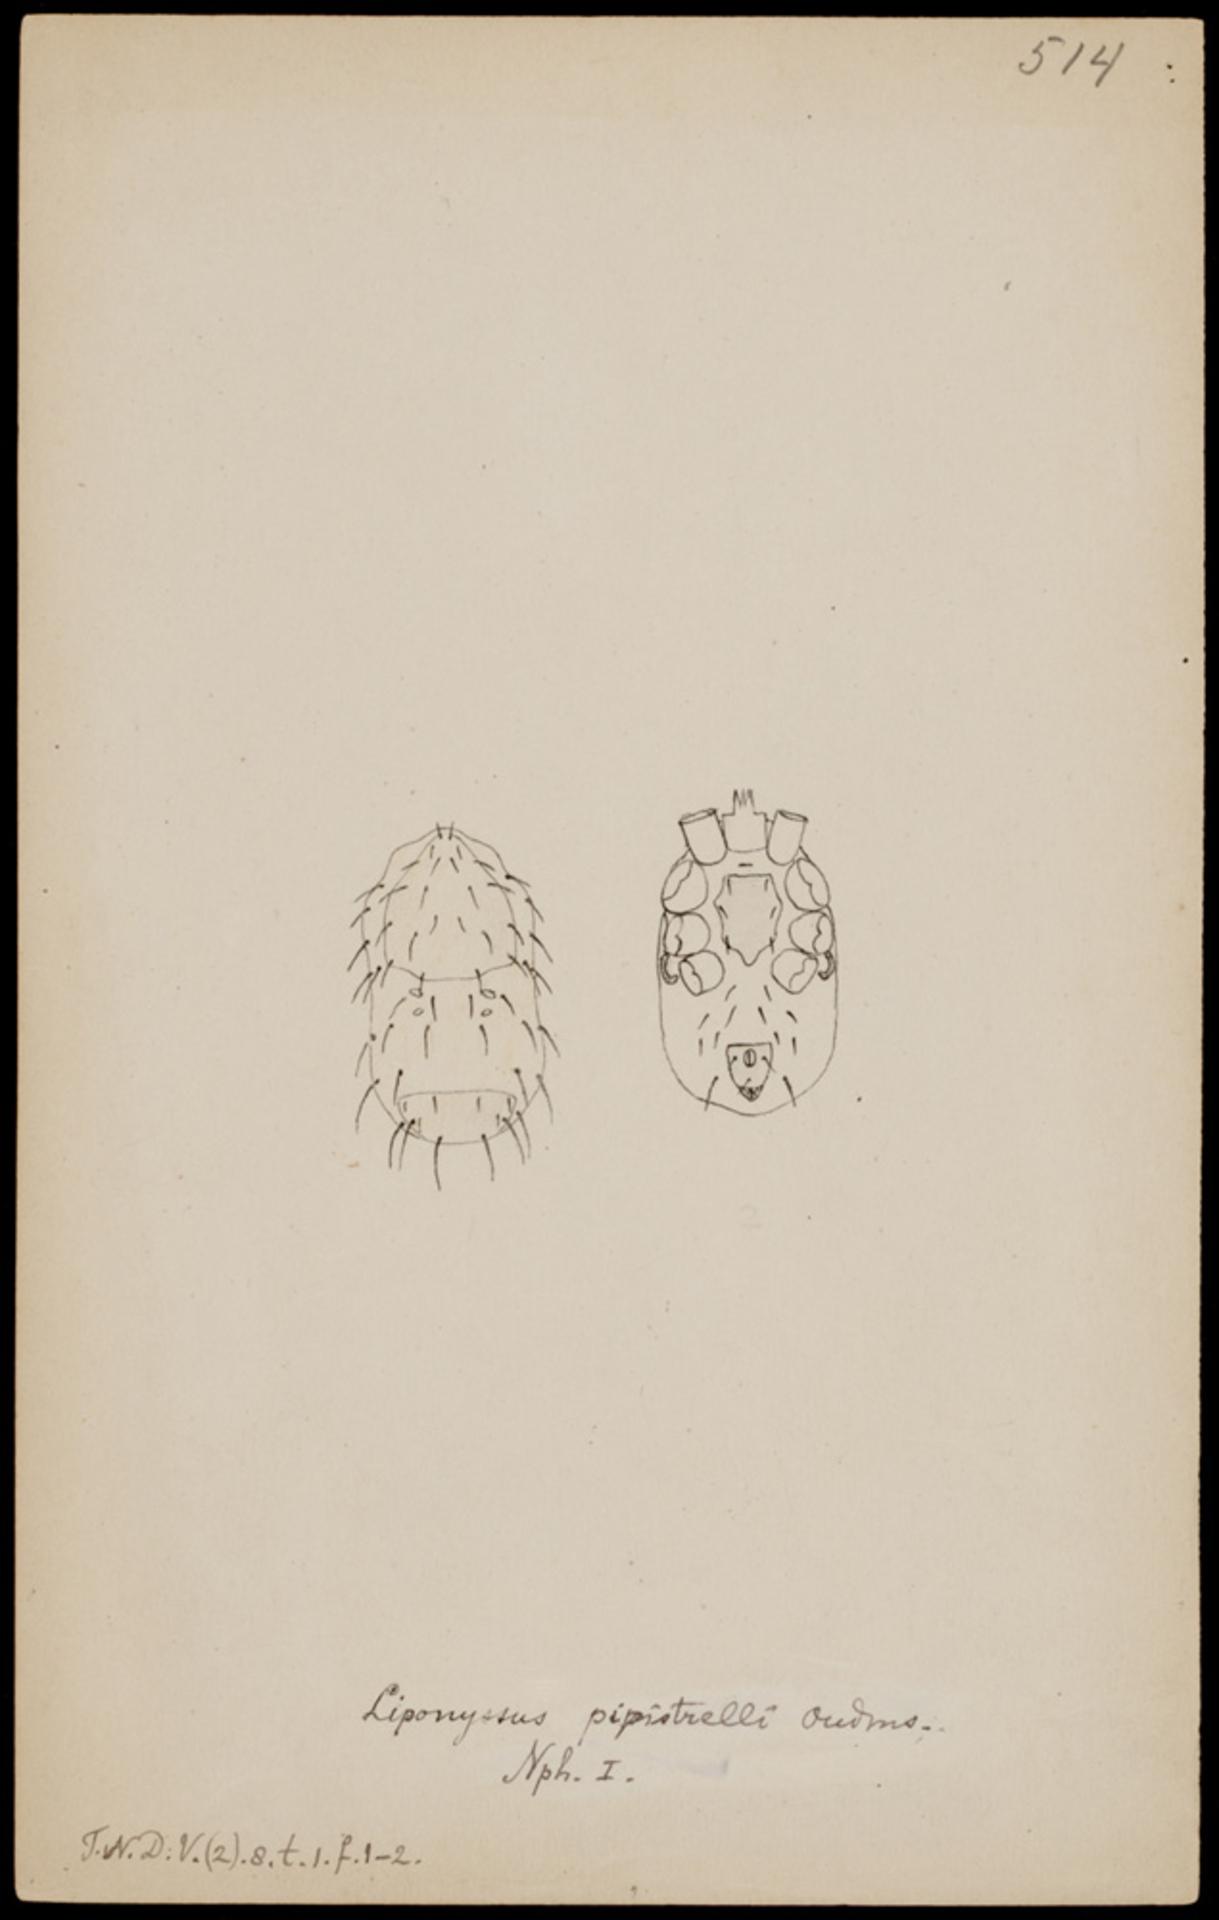 RMNH.ART.1247   Liponyssus pipistrelli (Oudemans)